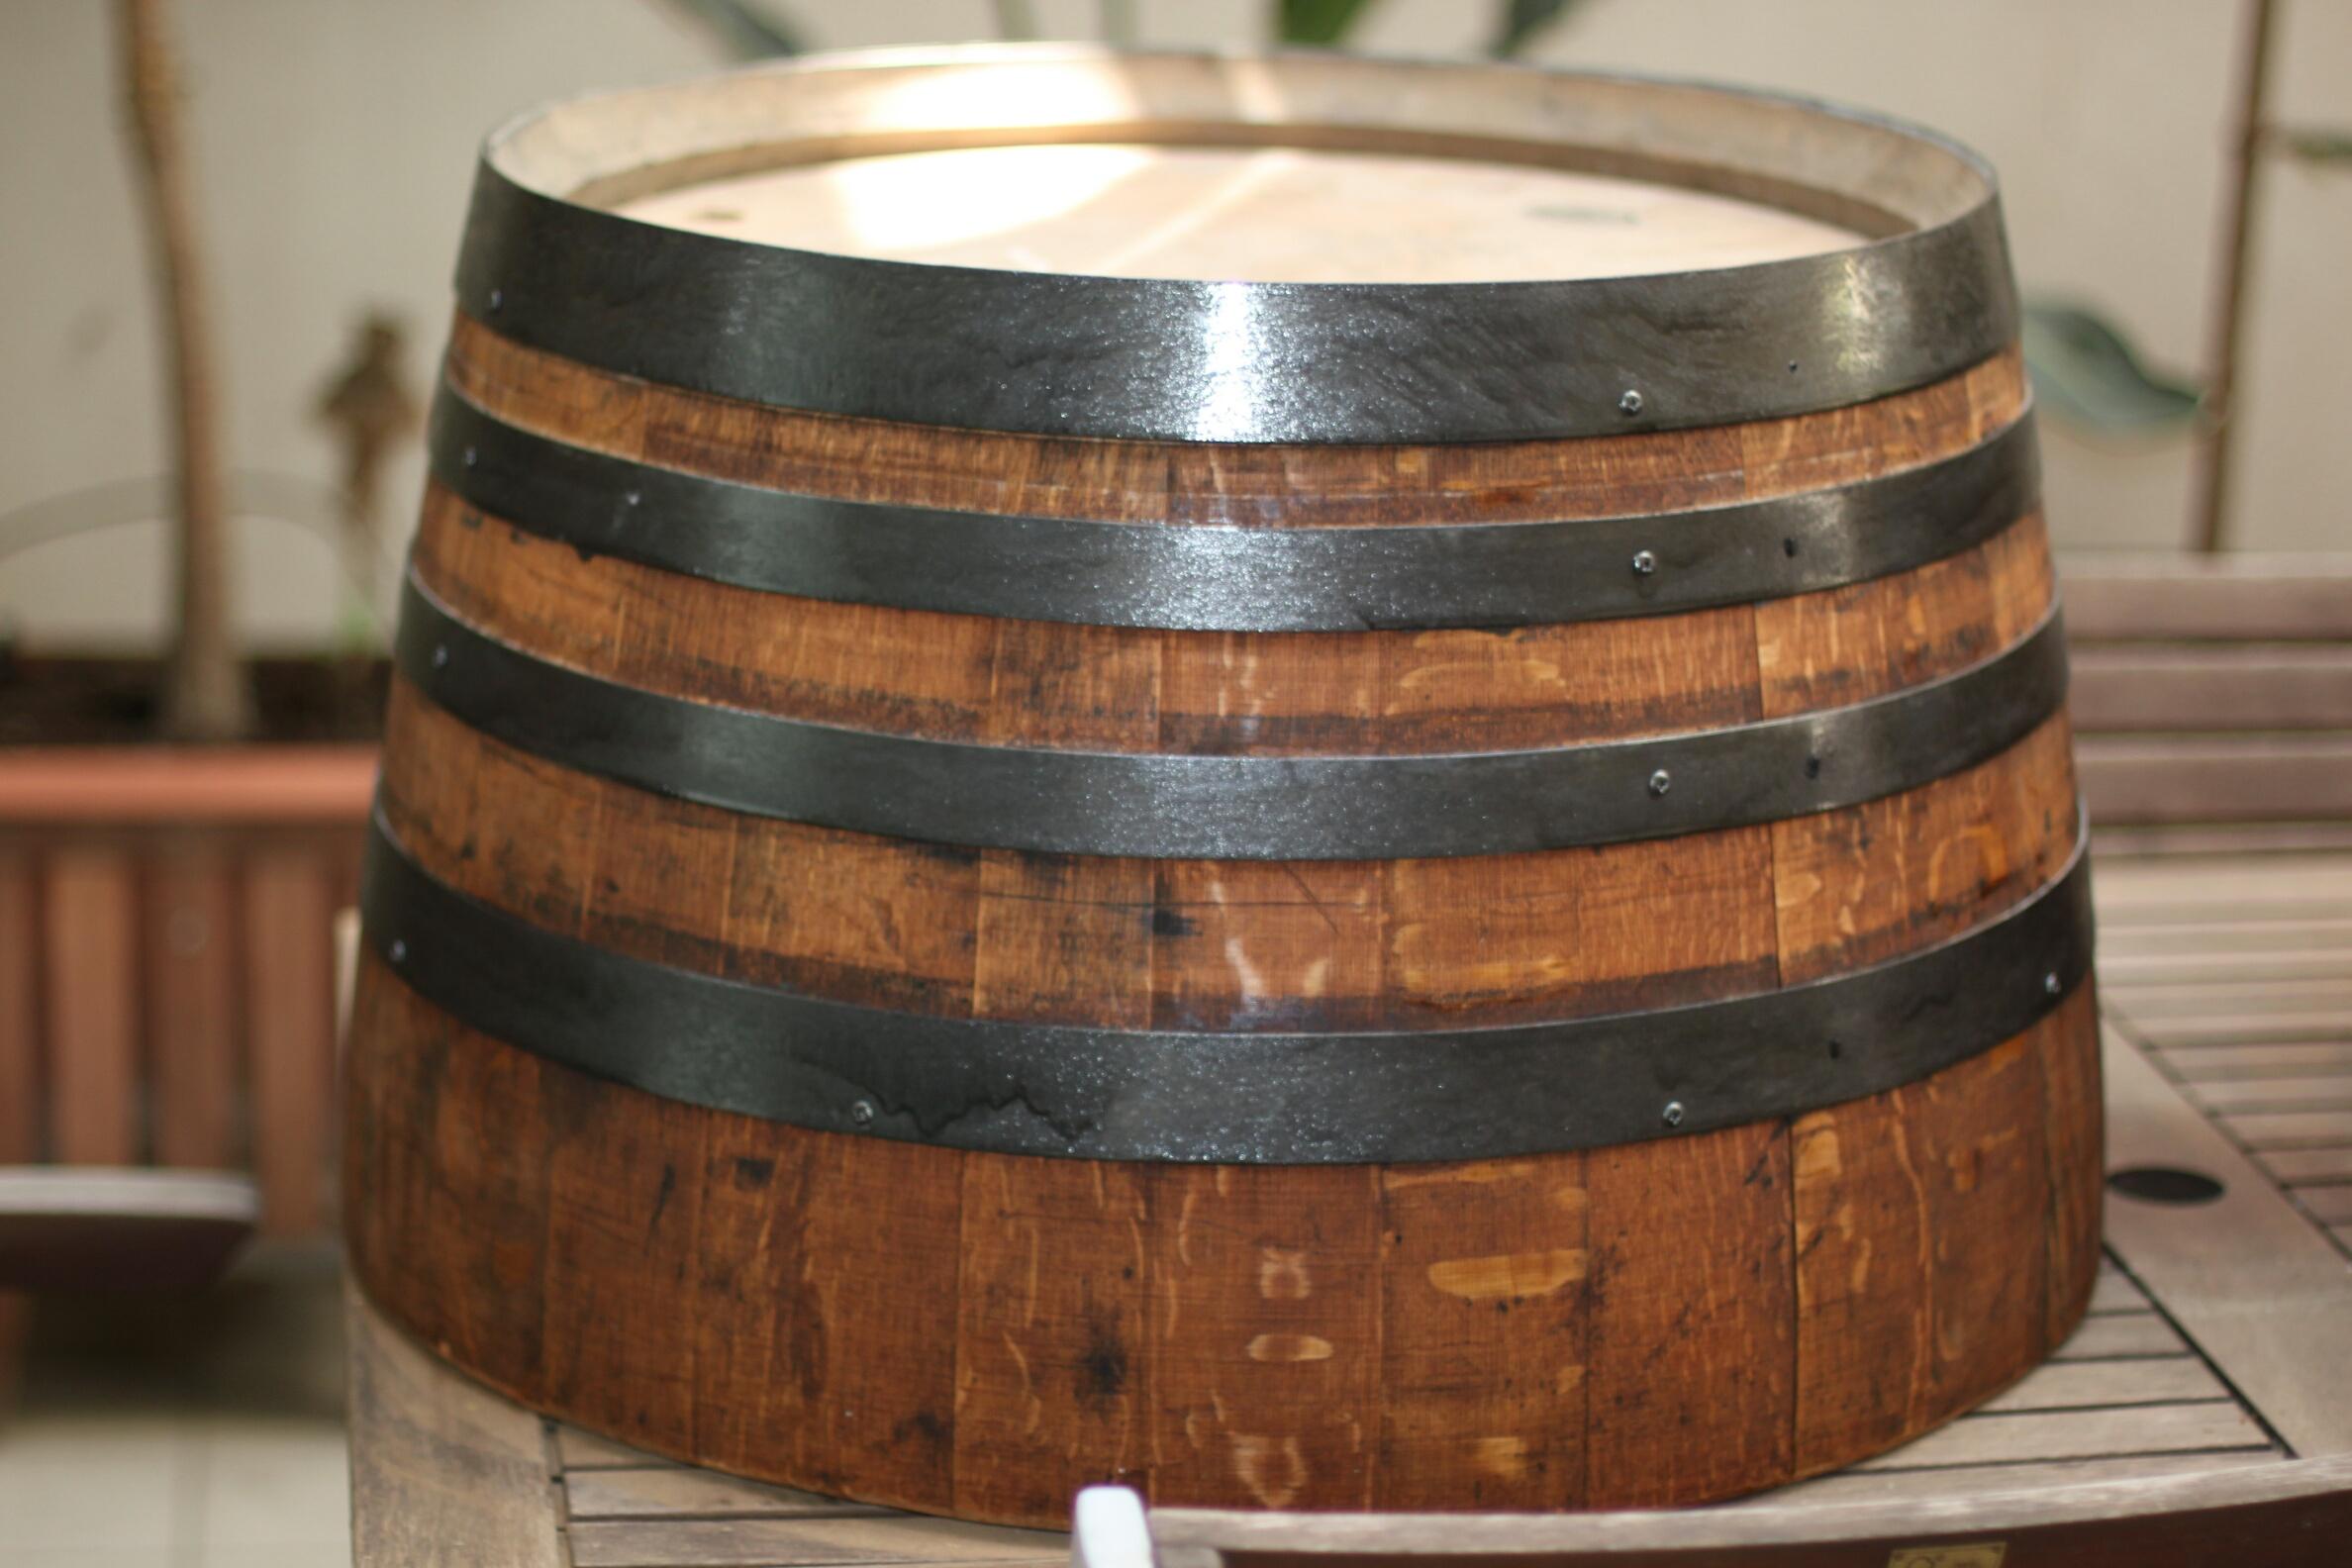 Maceteros de madera de barrica de roble tratada en barcelona carpinter a de aluminio barcelona - Maceteros de madera baratos ...